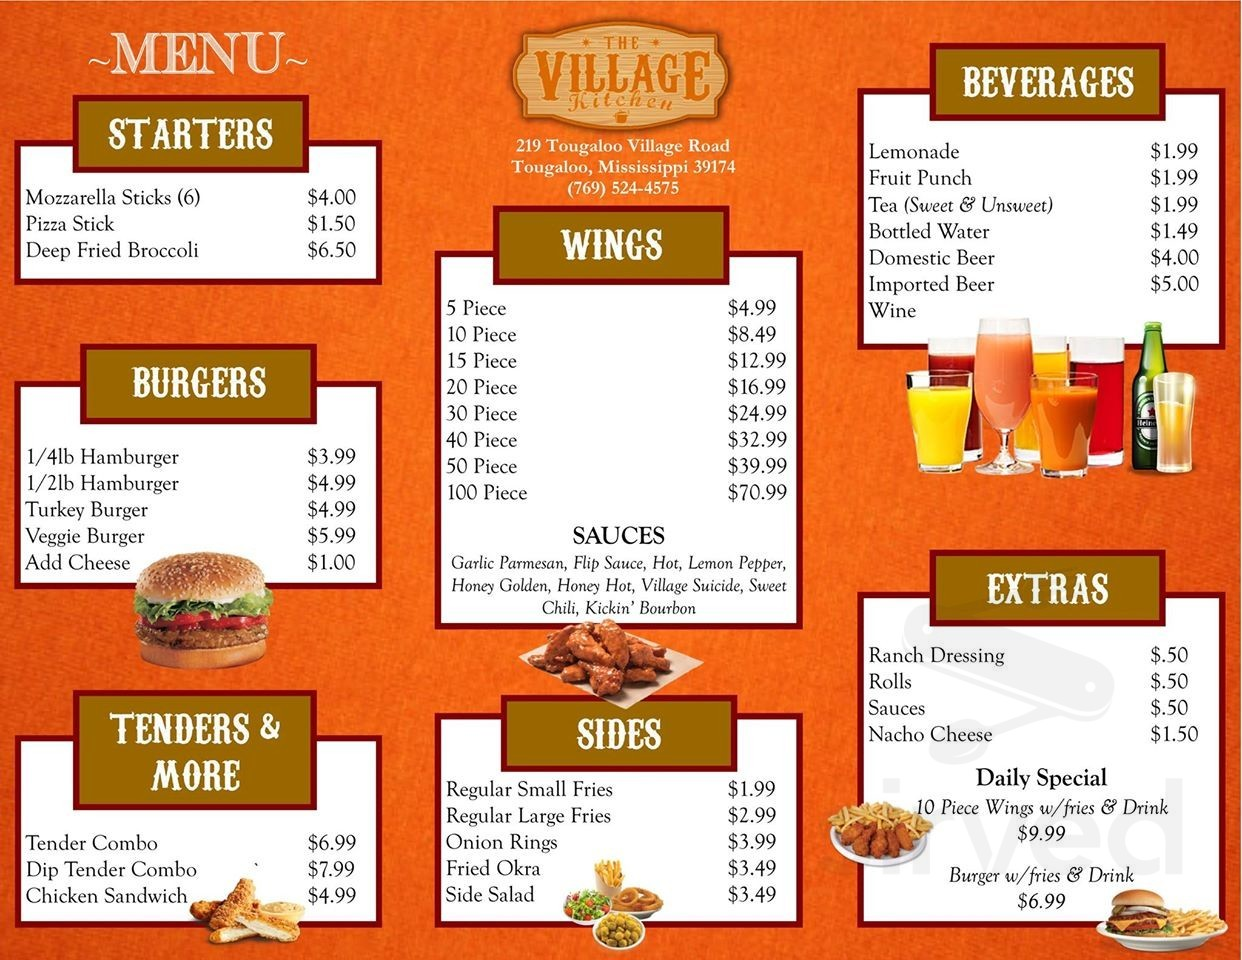 Menu For The Village Kitchen In Jackson Mississippi Usa